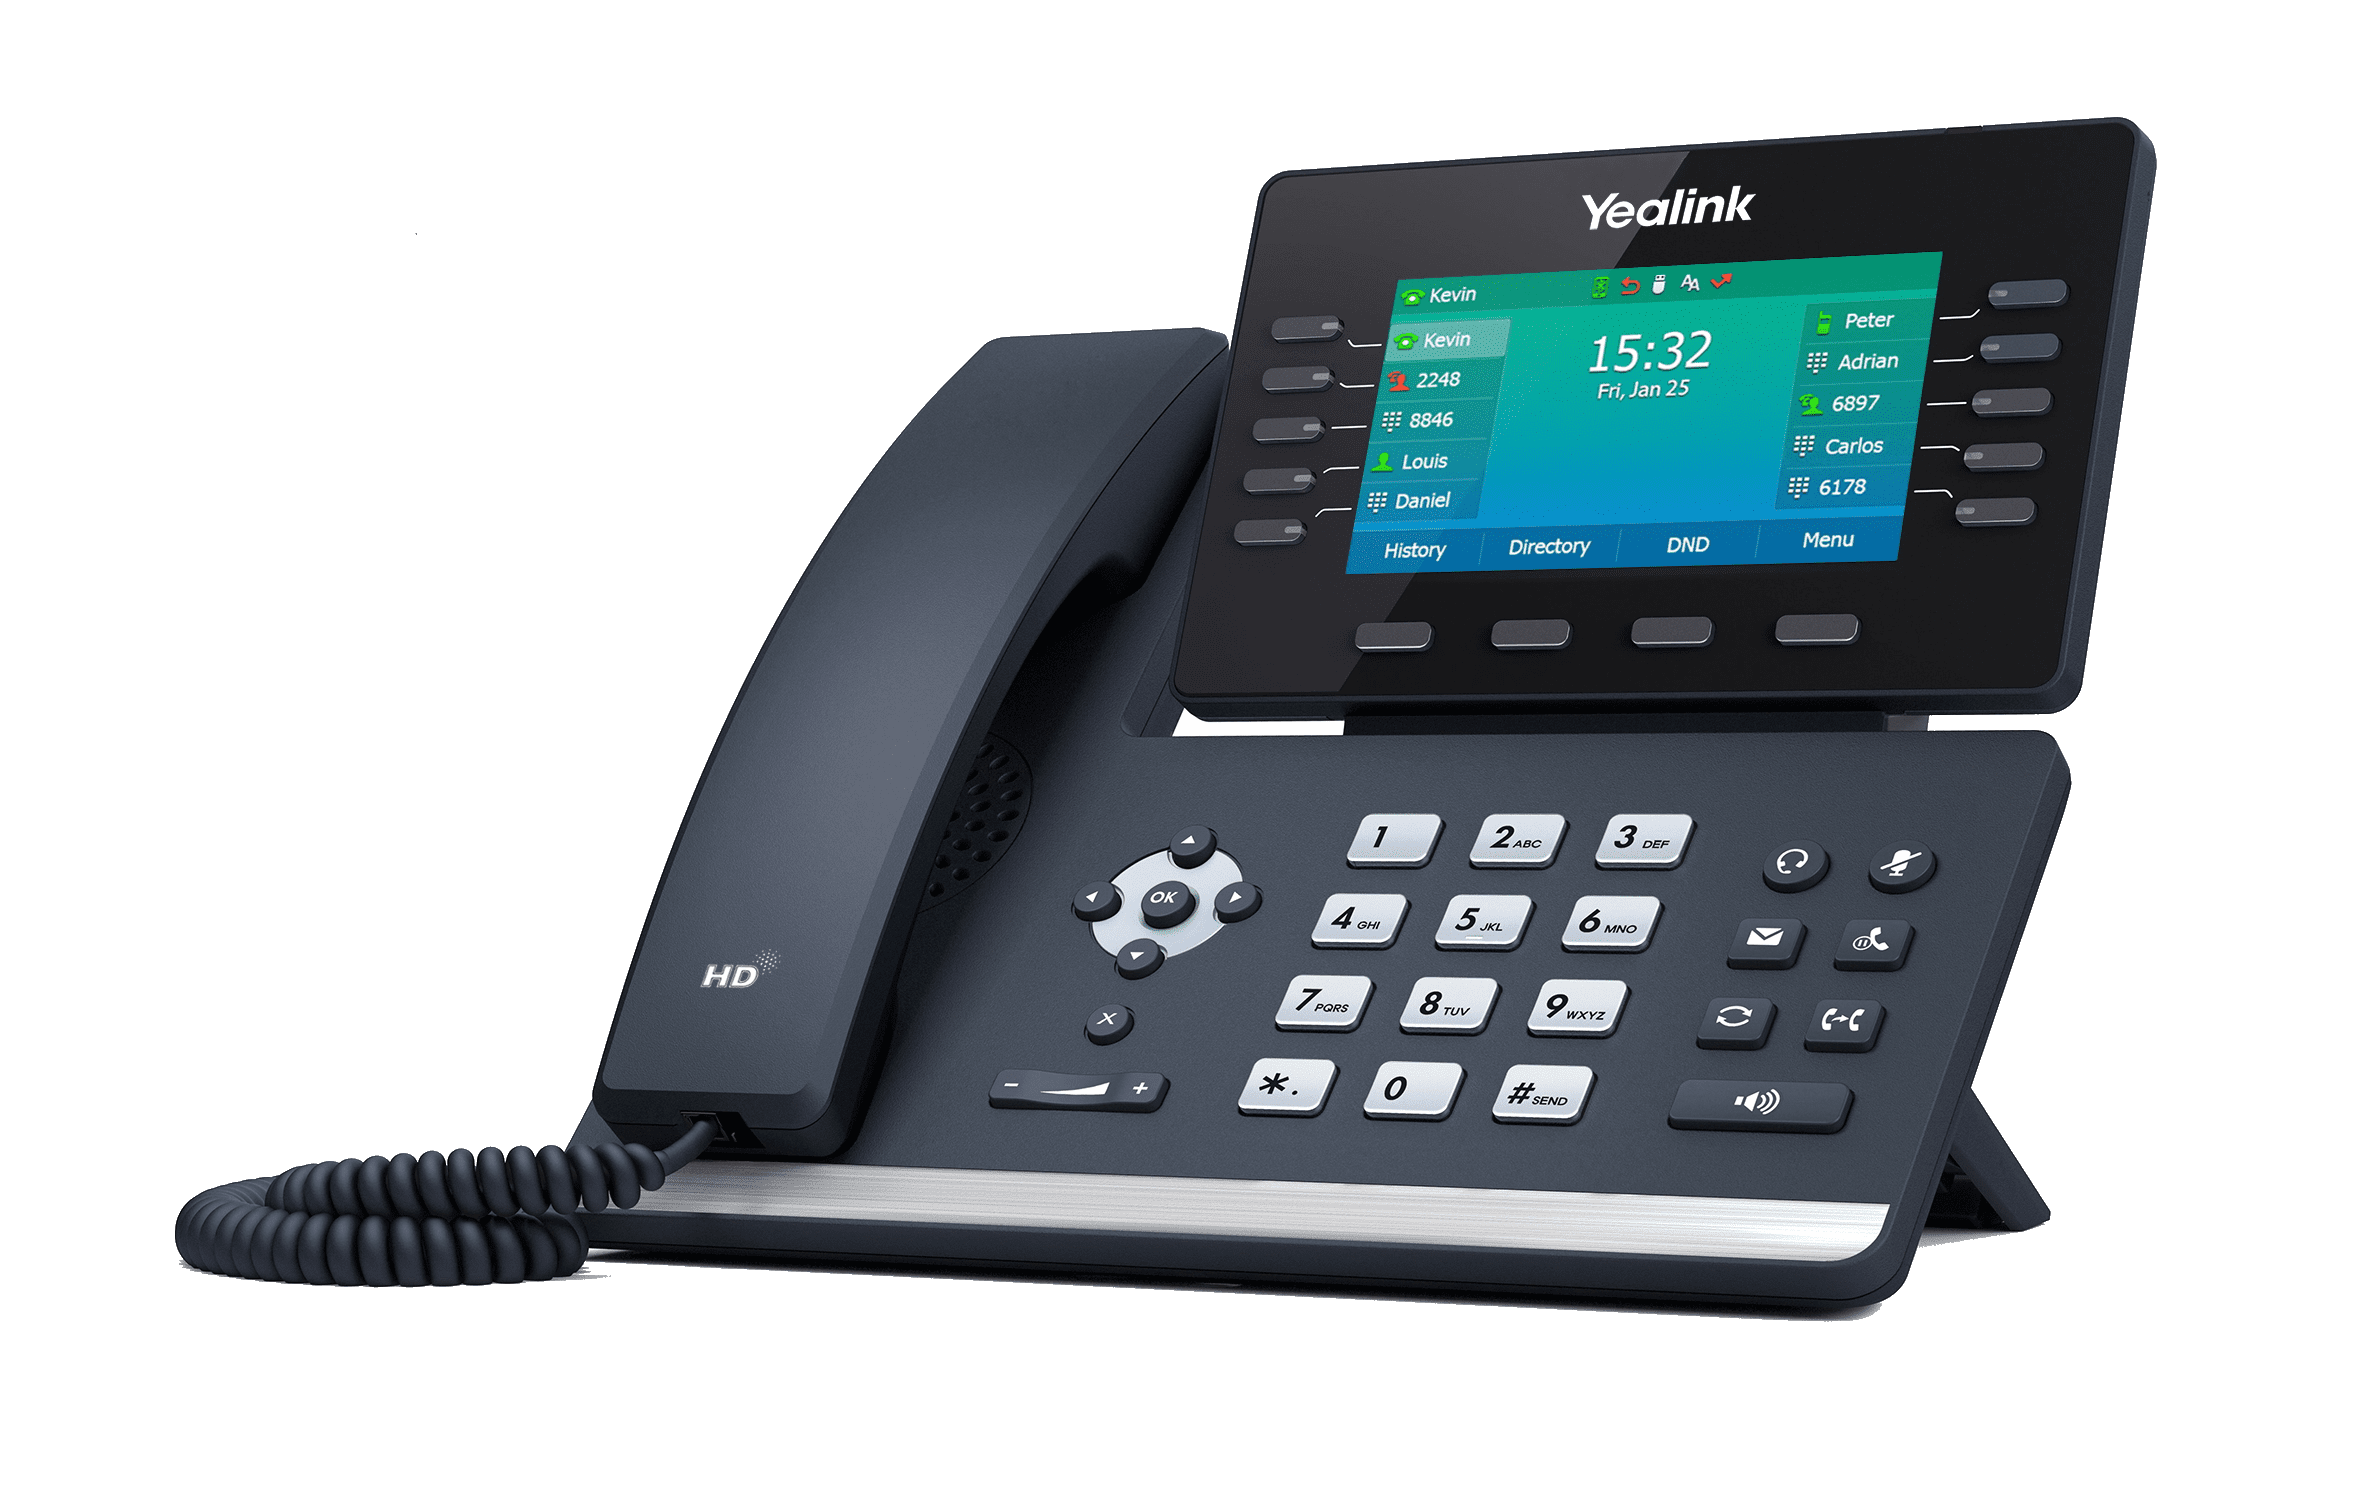 Yealink T54W Model Phone